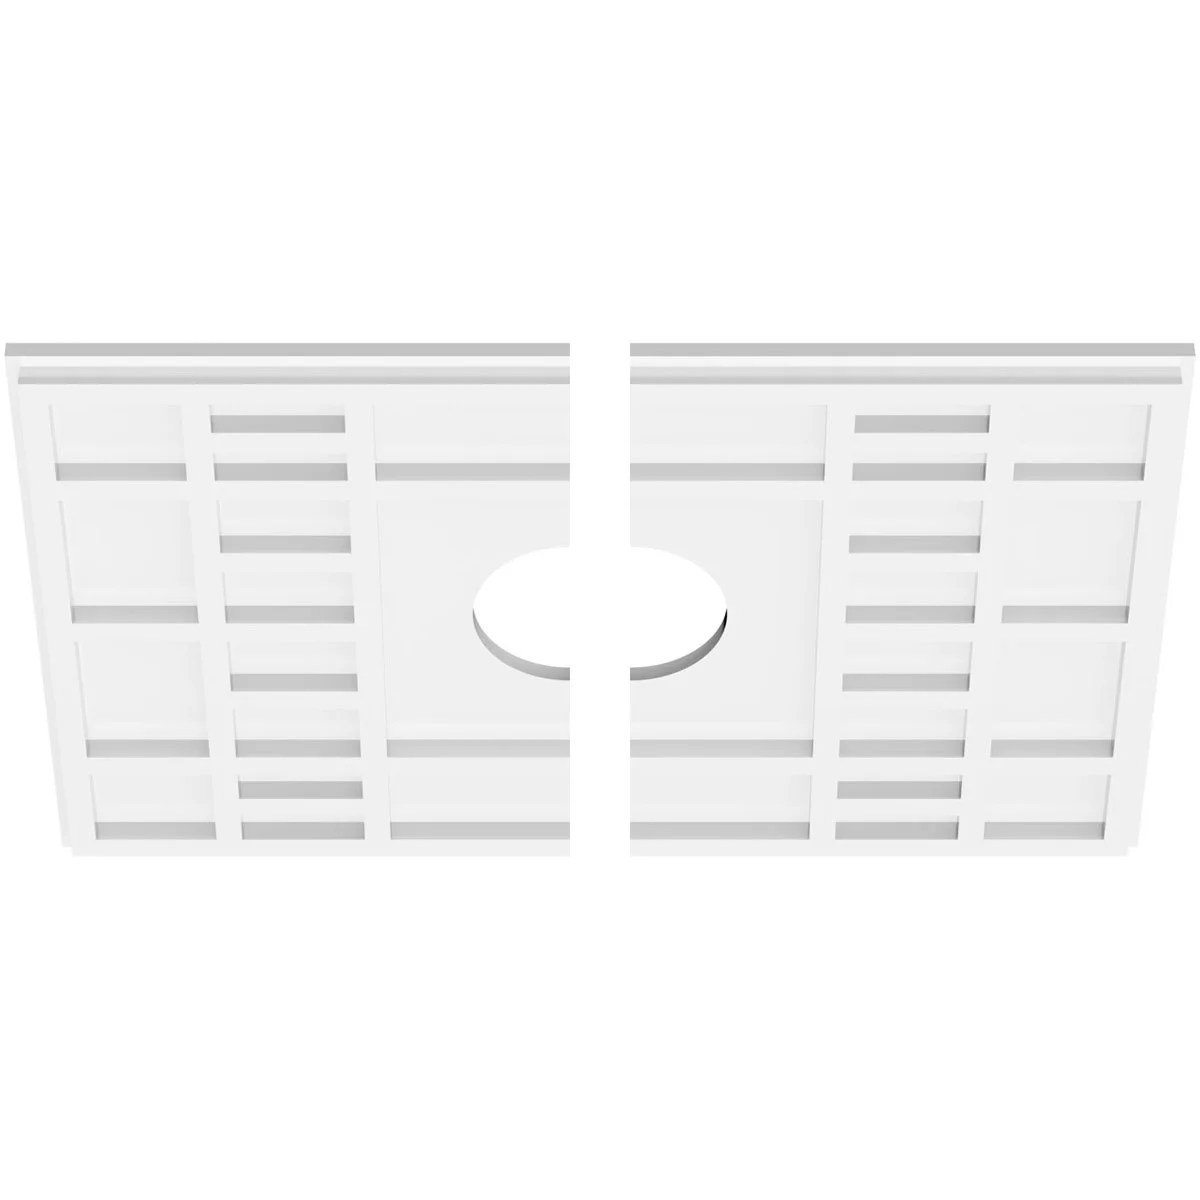 Ekena Millwork Beaux Architectural Grade Pvc Ceiling